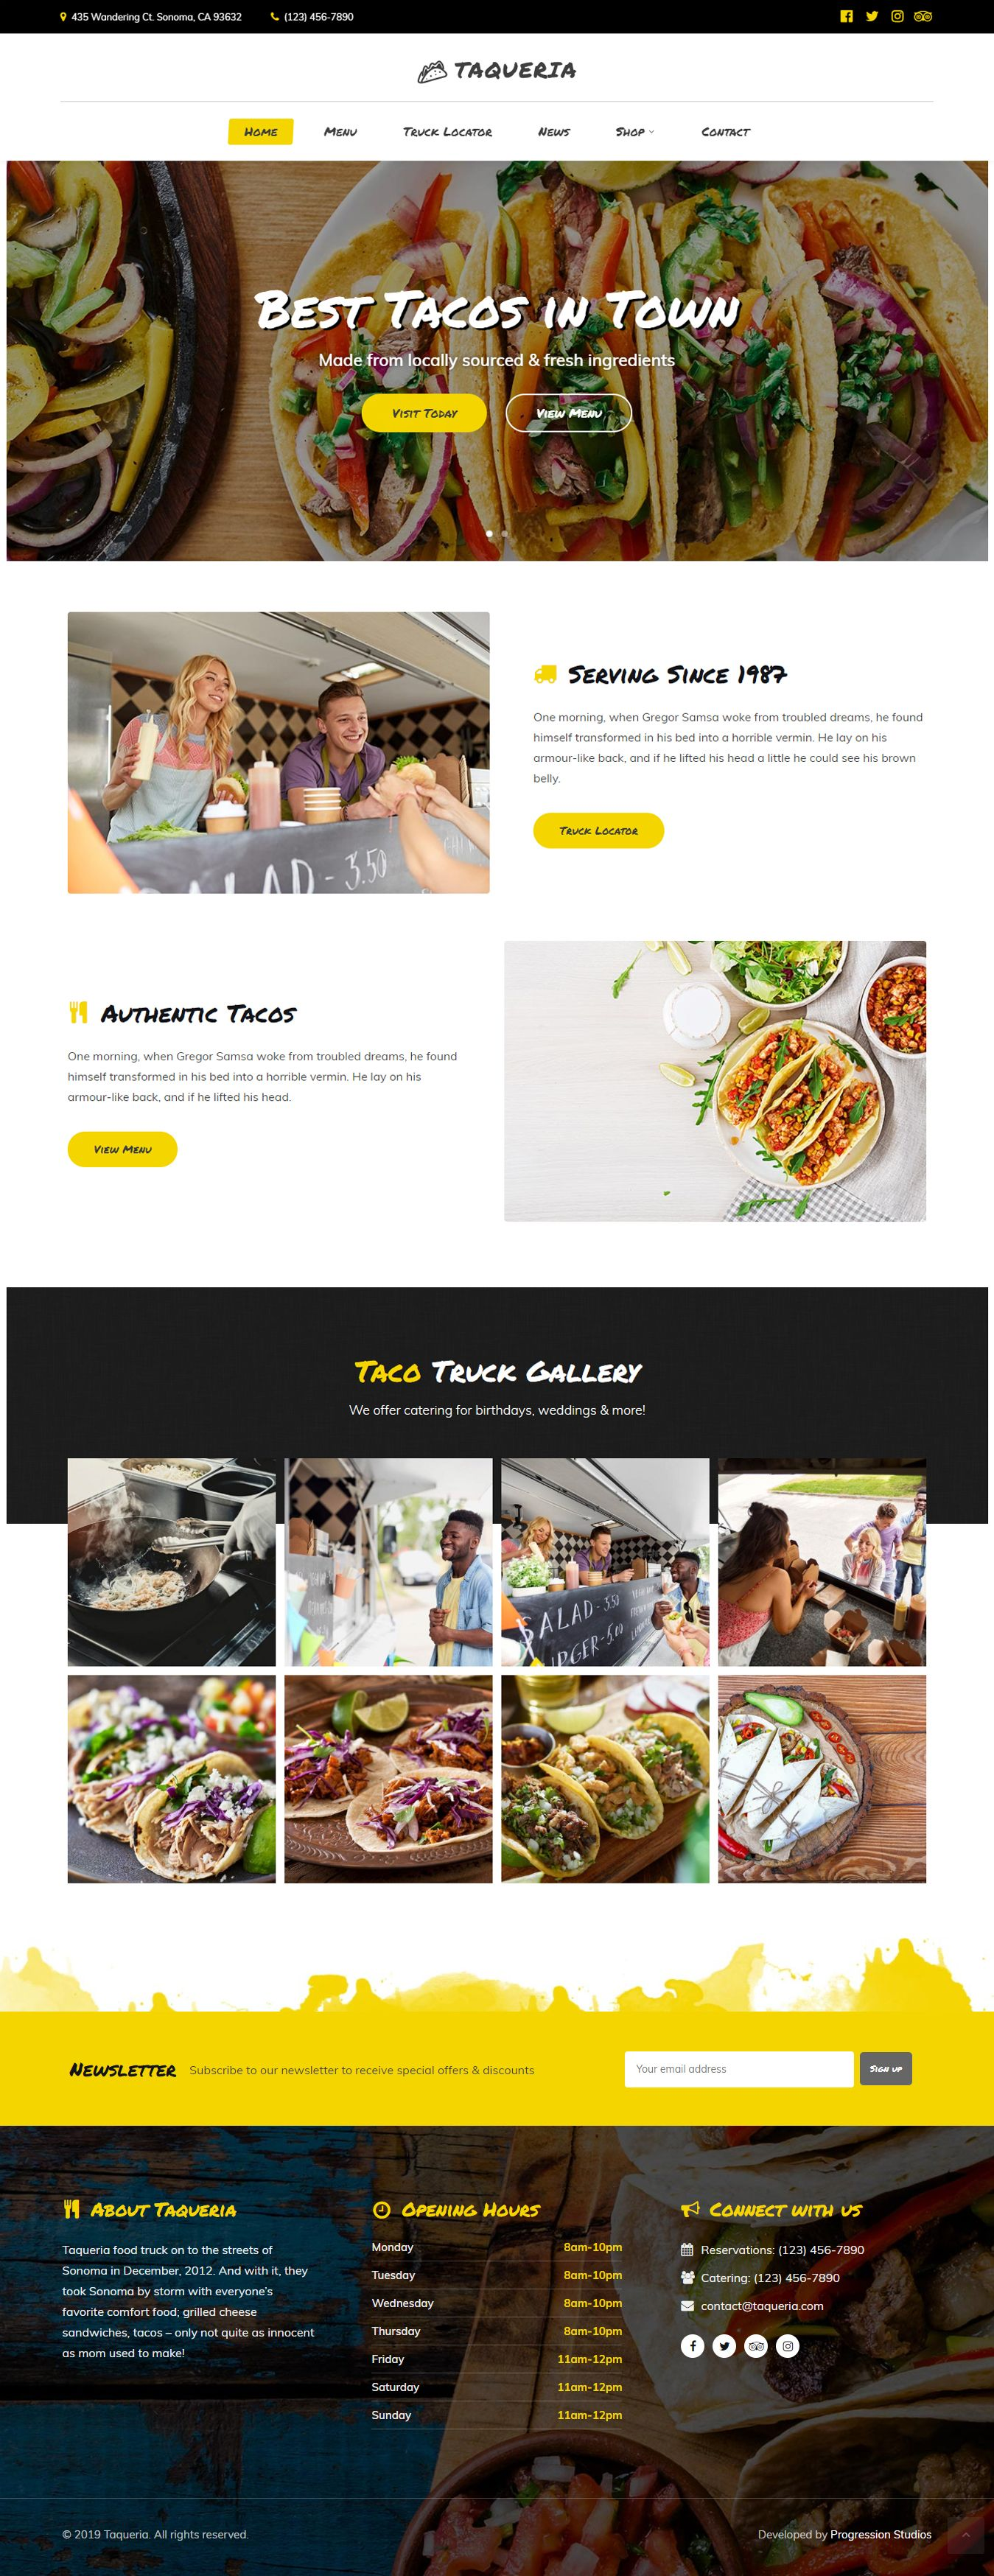 Taqueria Food Truck Restaurant Theme Truck Restaurant Restaurant Themes Restaurant Wordpress Themes